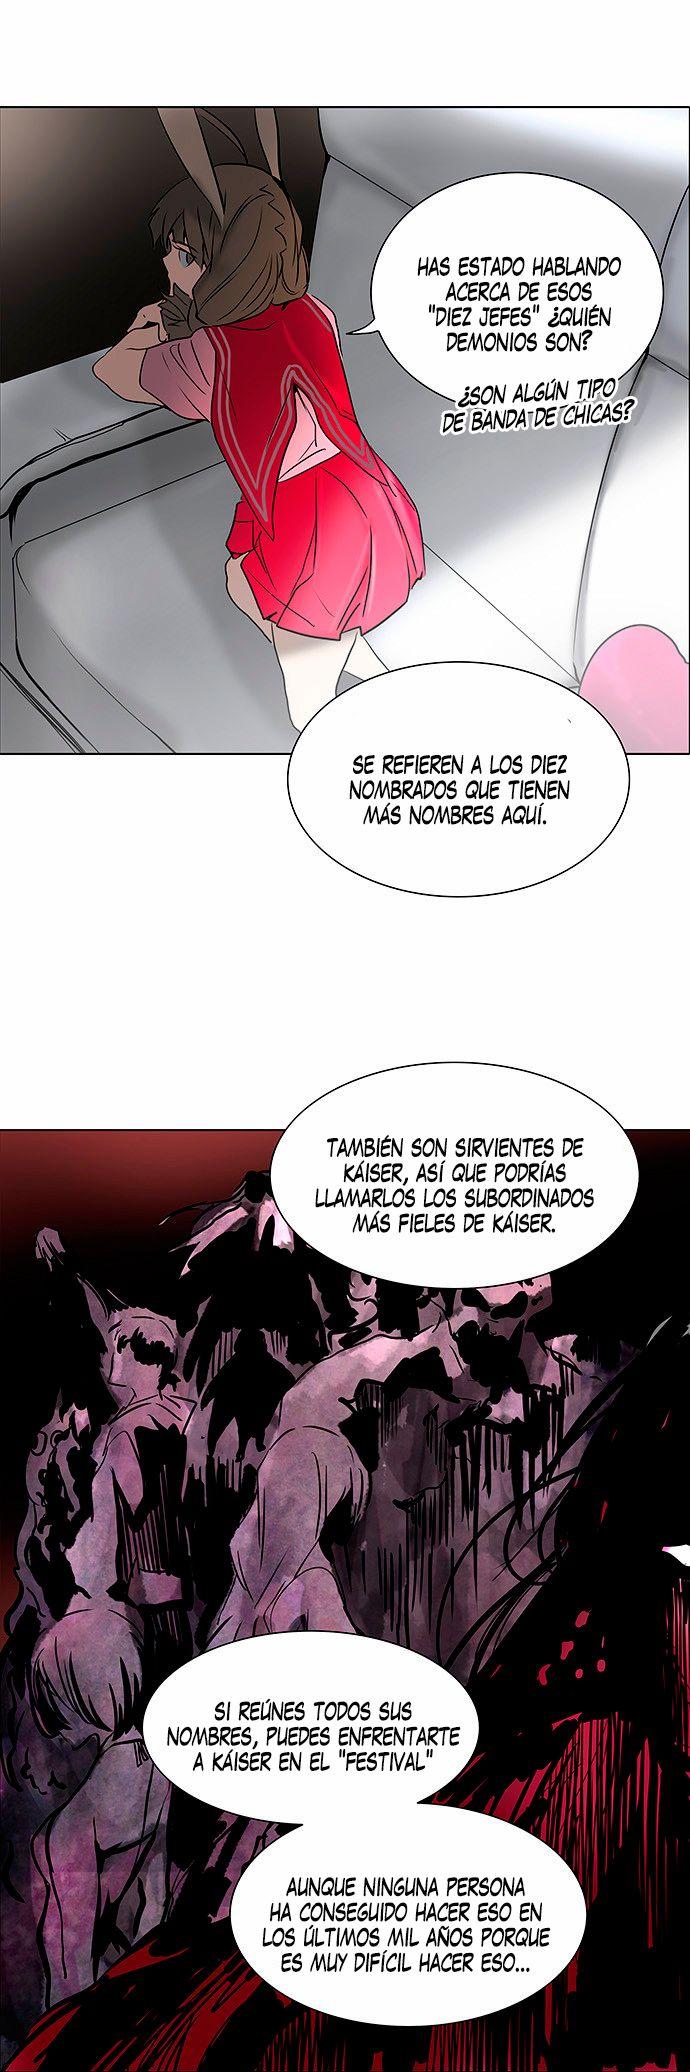 http://c5.ninemanga.com/es_manga/21/149/467427/f69041d874533096748e2d77480c1fea.jpg Page 54